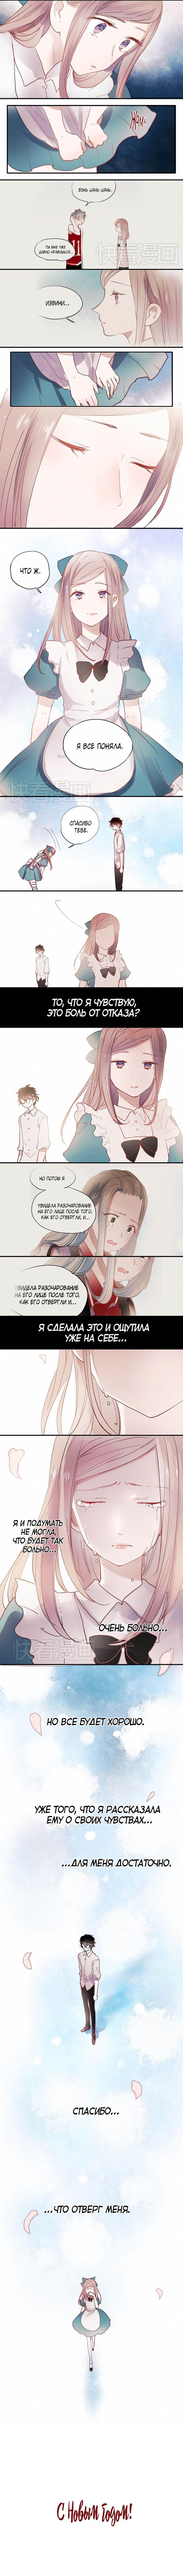 https://r1.ninemanga.com/comics/pic2/38/31270/409545/151928326875.jpg Page 4